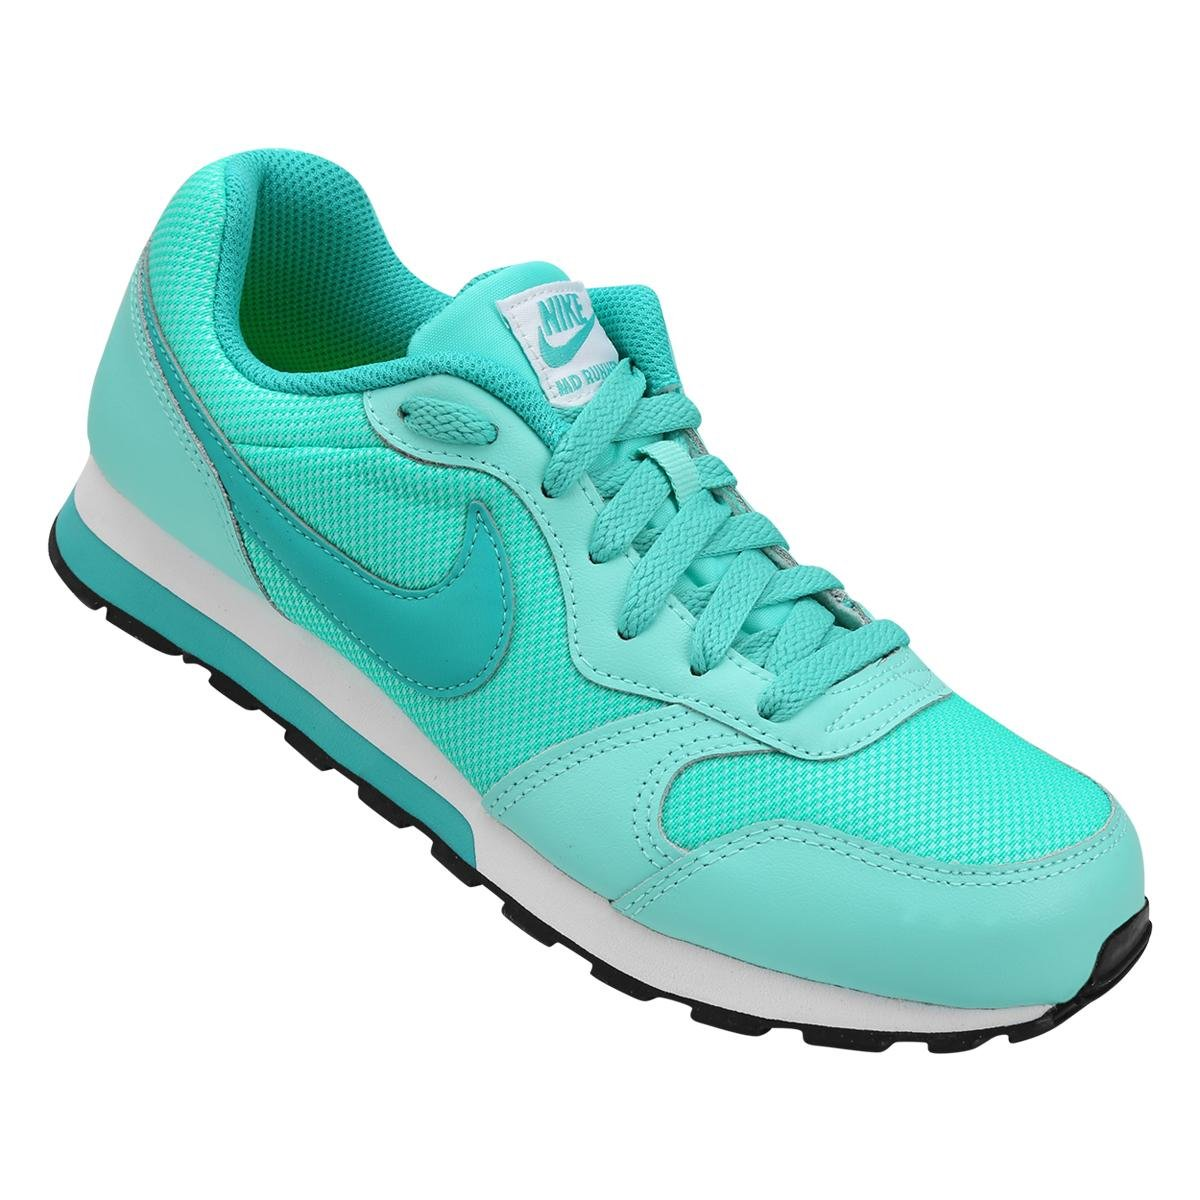 Parche Molestar Insignia  Tênis Infantil Nike Md Runner 2   Netshoes